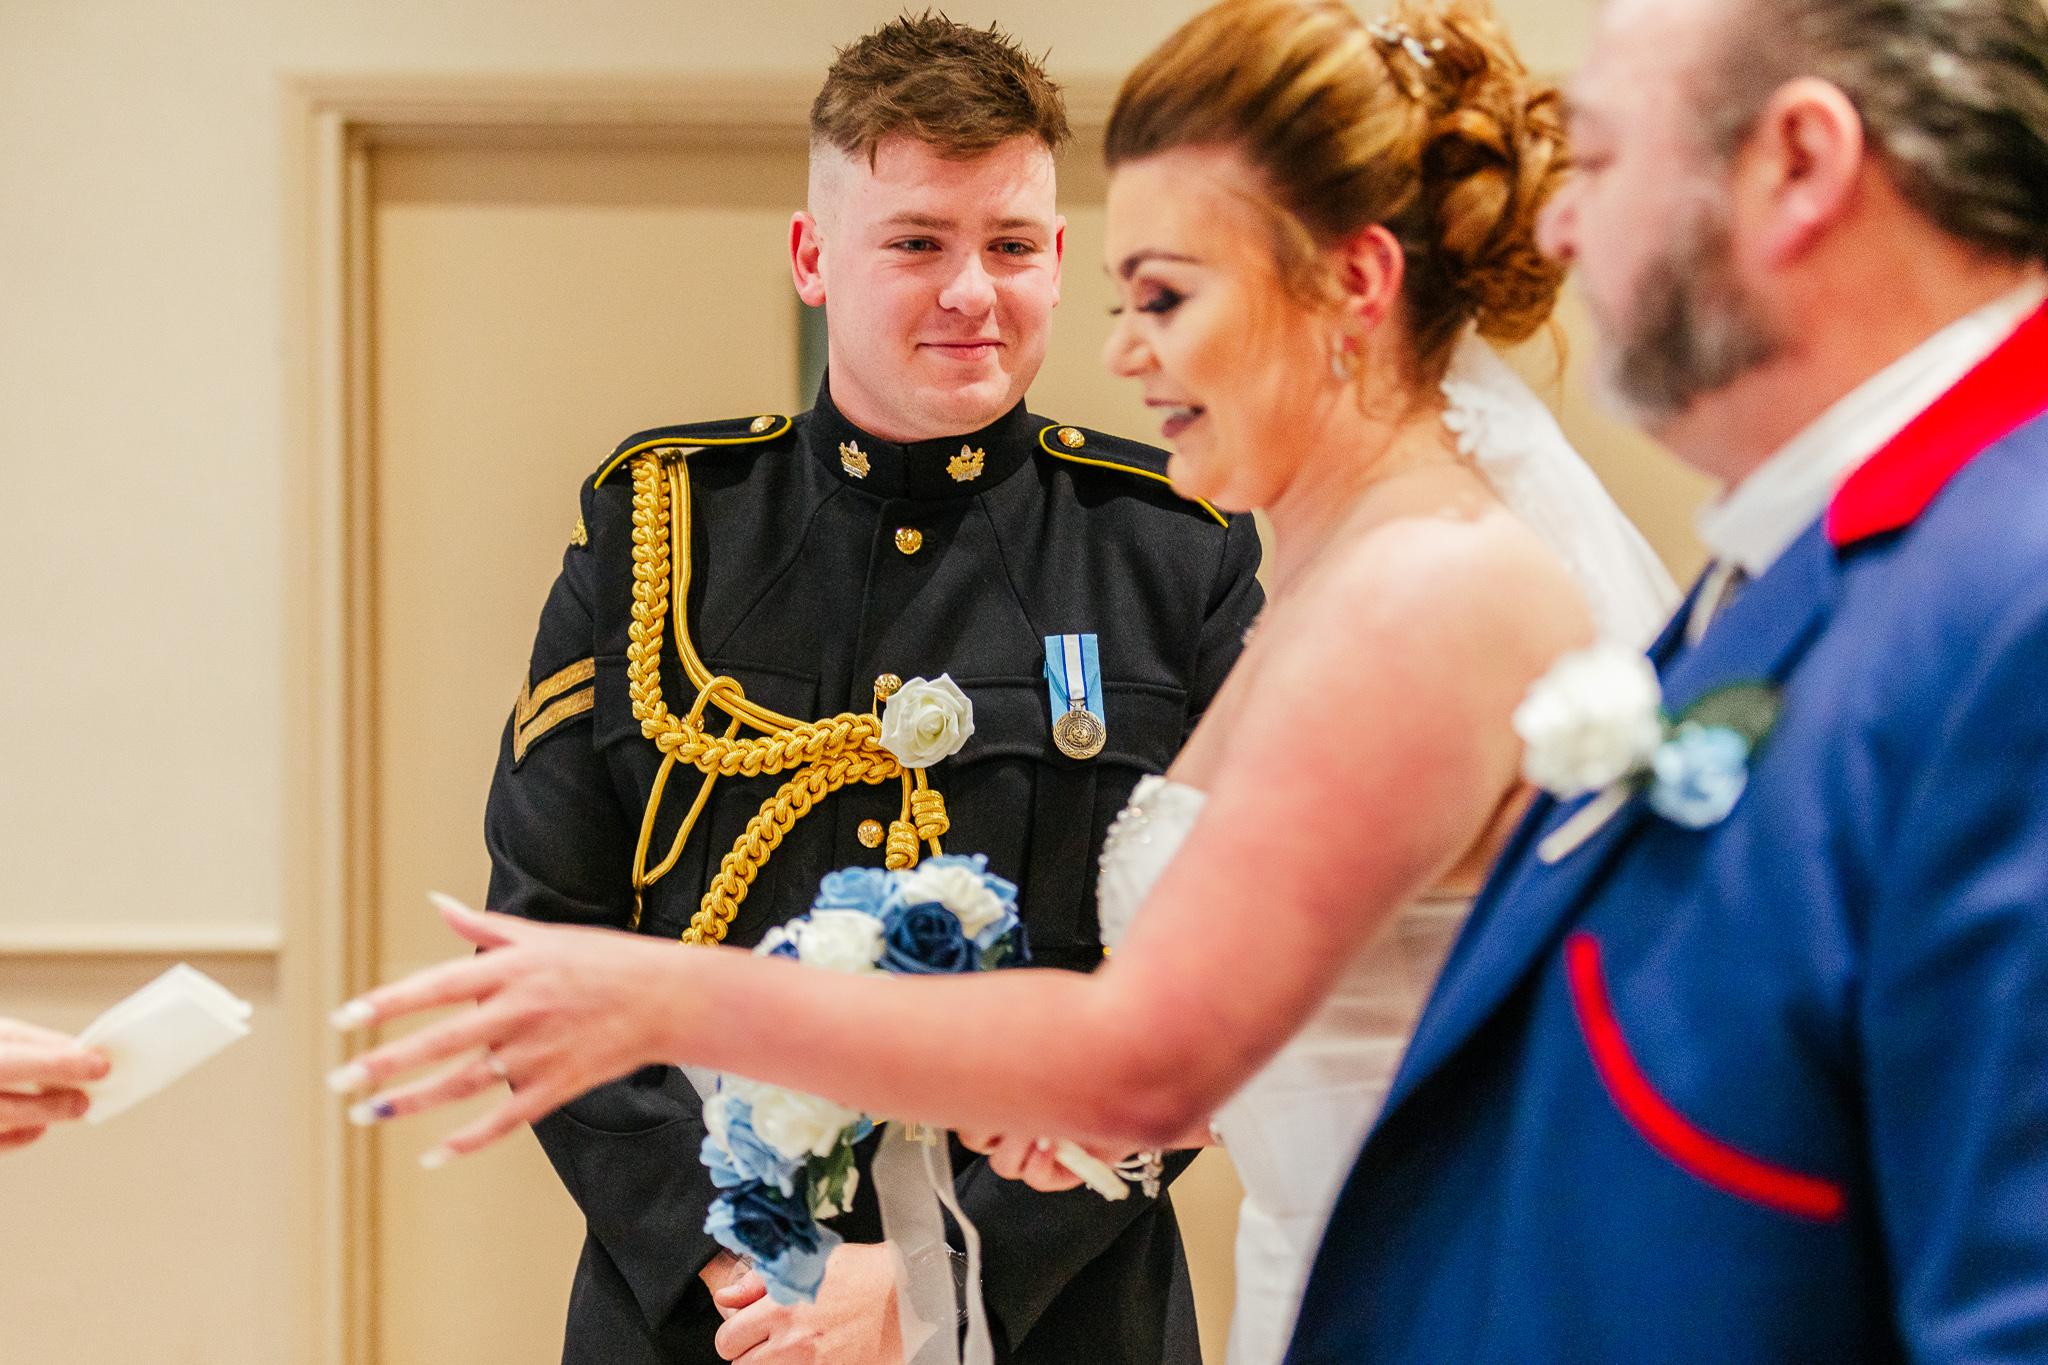 Mollingtonbanastre_wedding-4.jpg